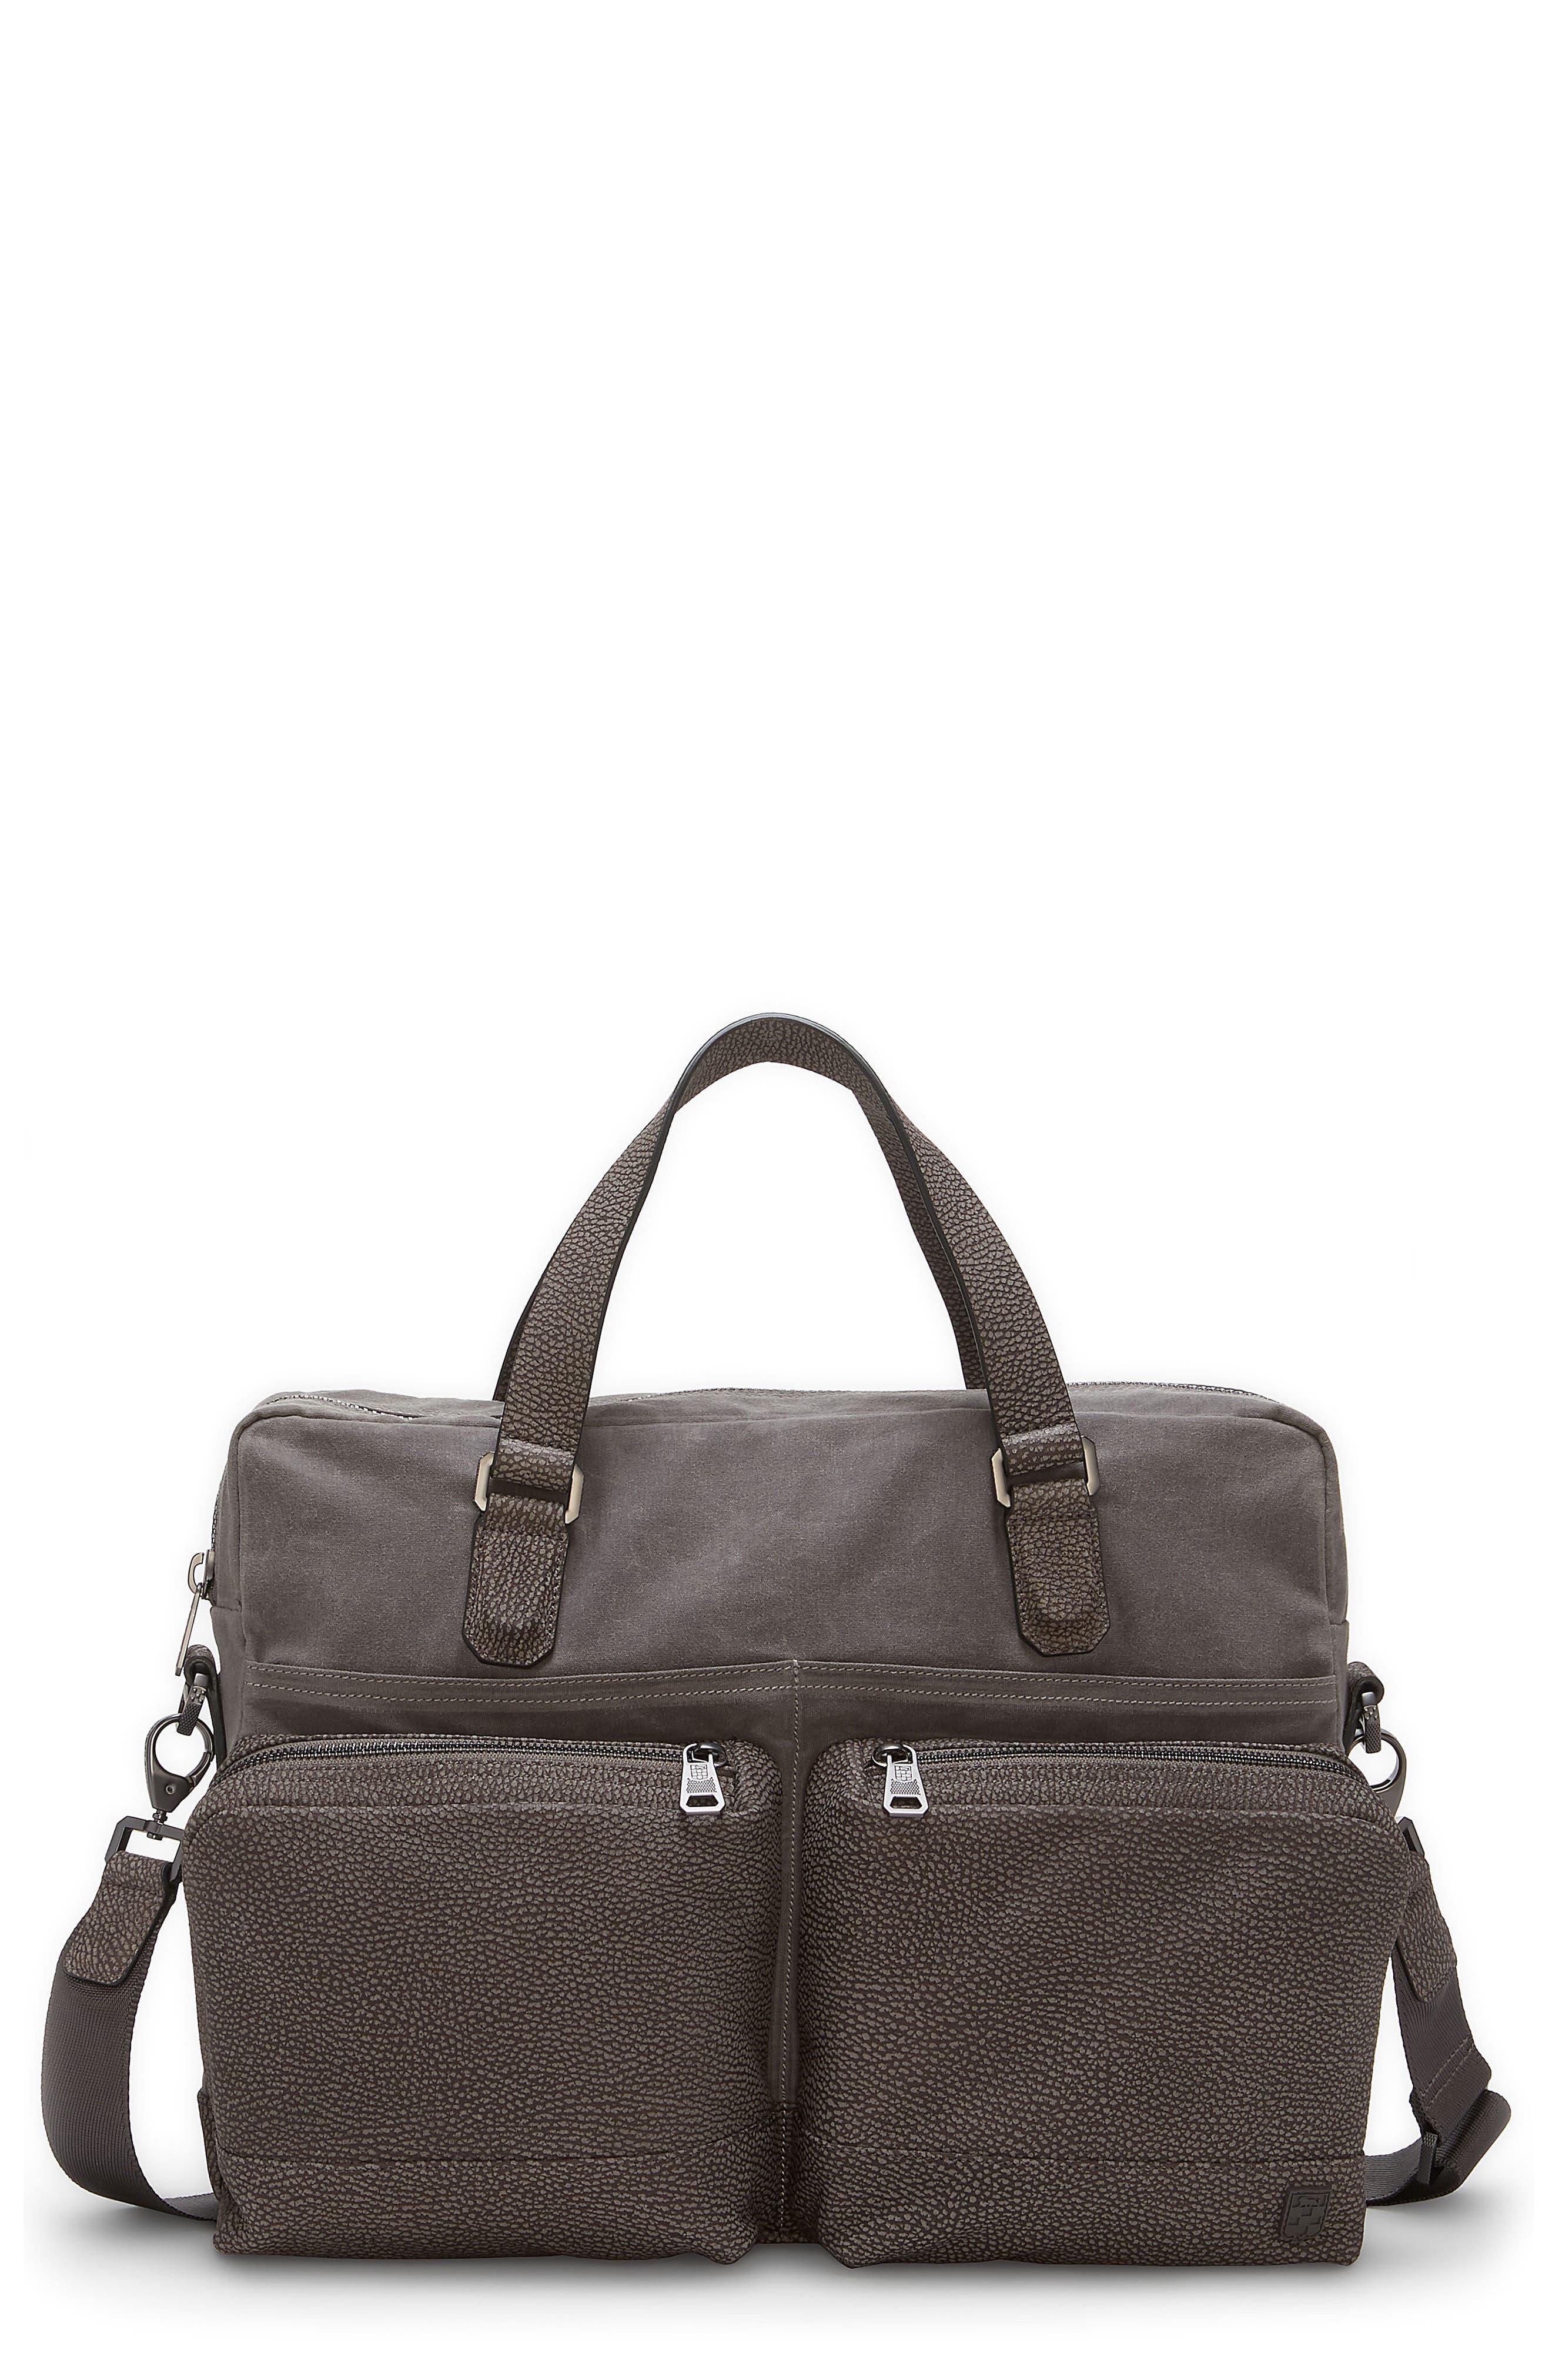 Basin Satchel Briefcase,                             Main thumbnail 1, color,                             Steeple Grey